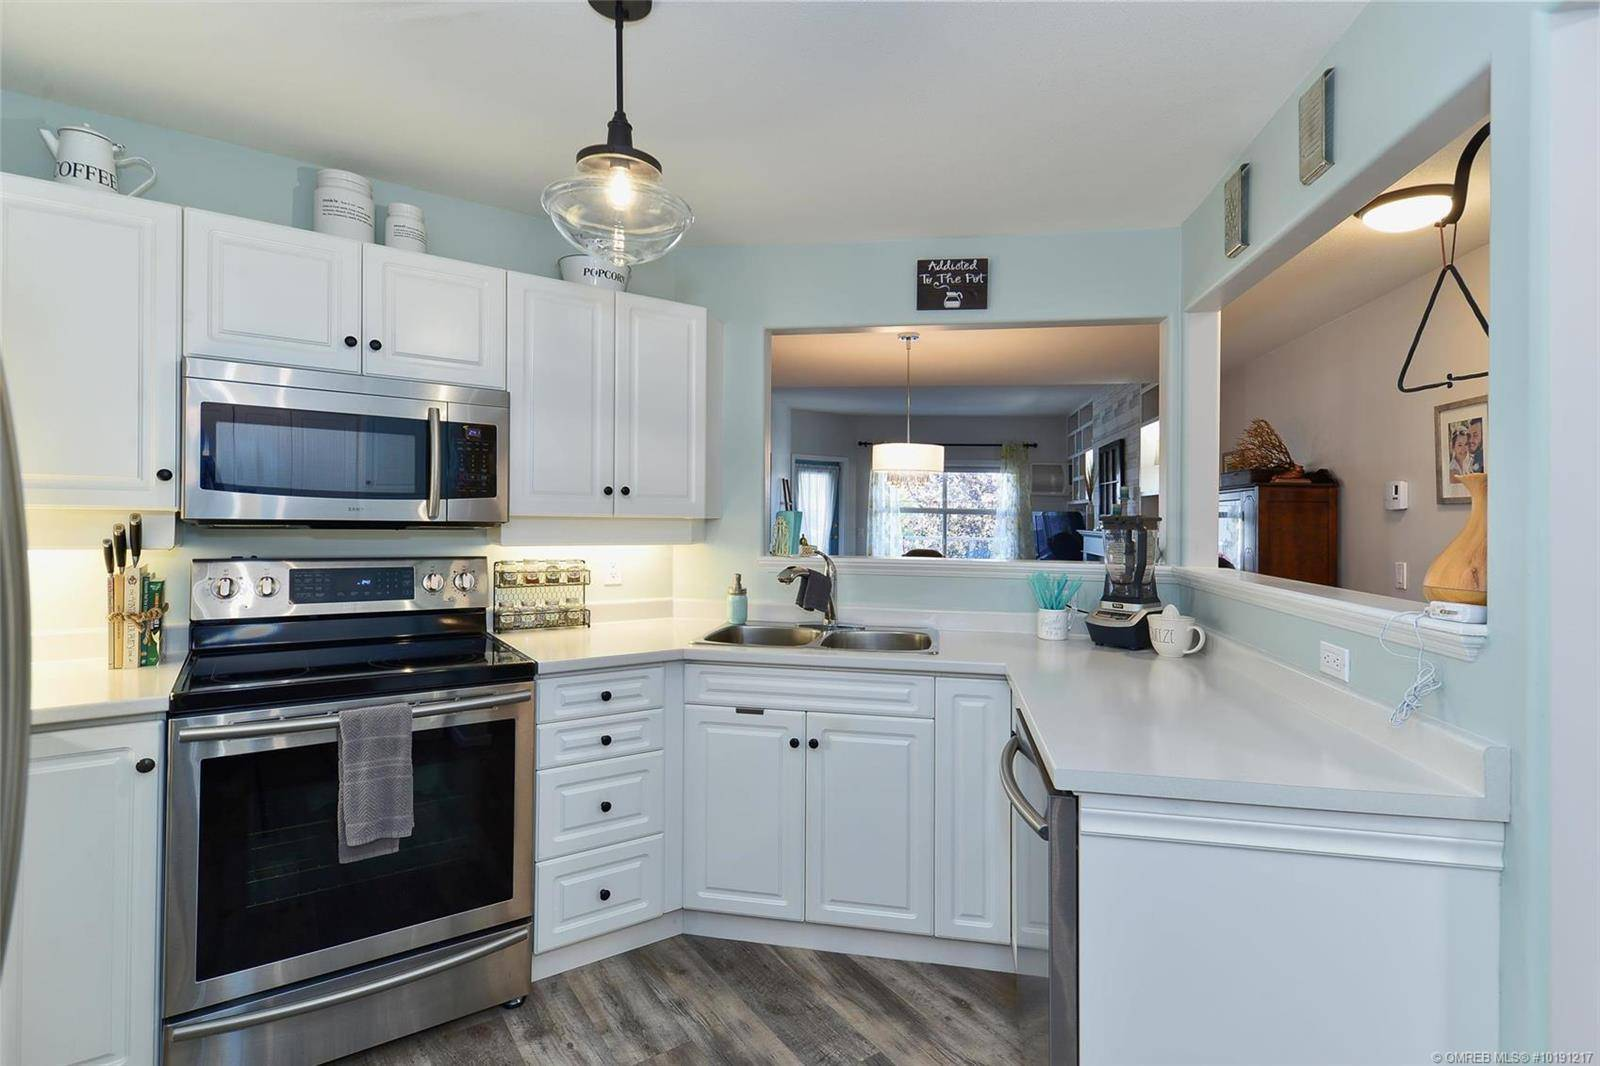 Condo for sale at 555 Houghton Rd Unit 310 Kelowna British Columbia - MLS: 10191217